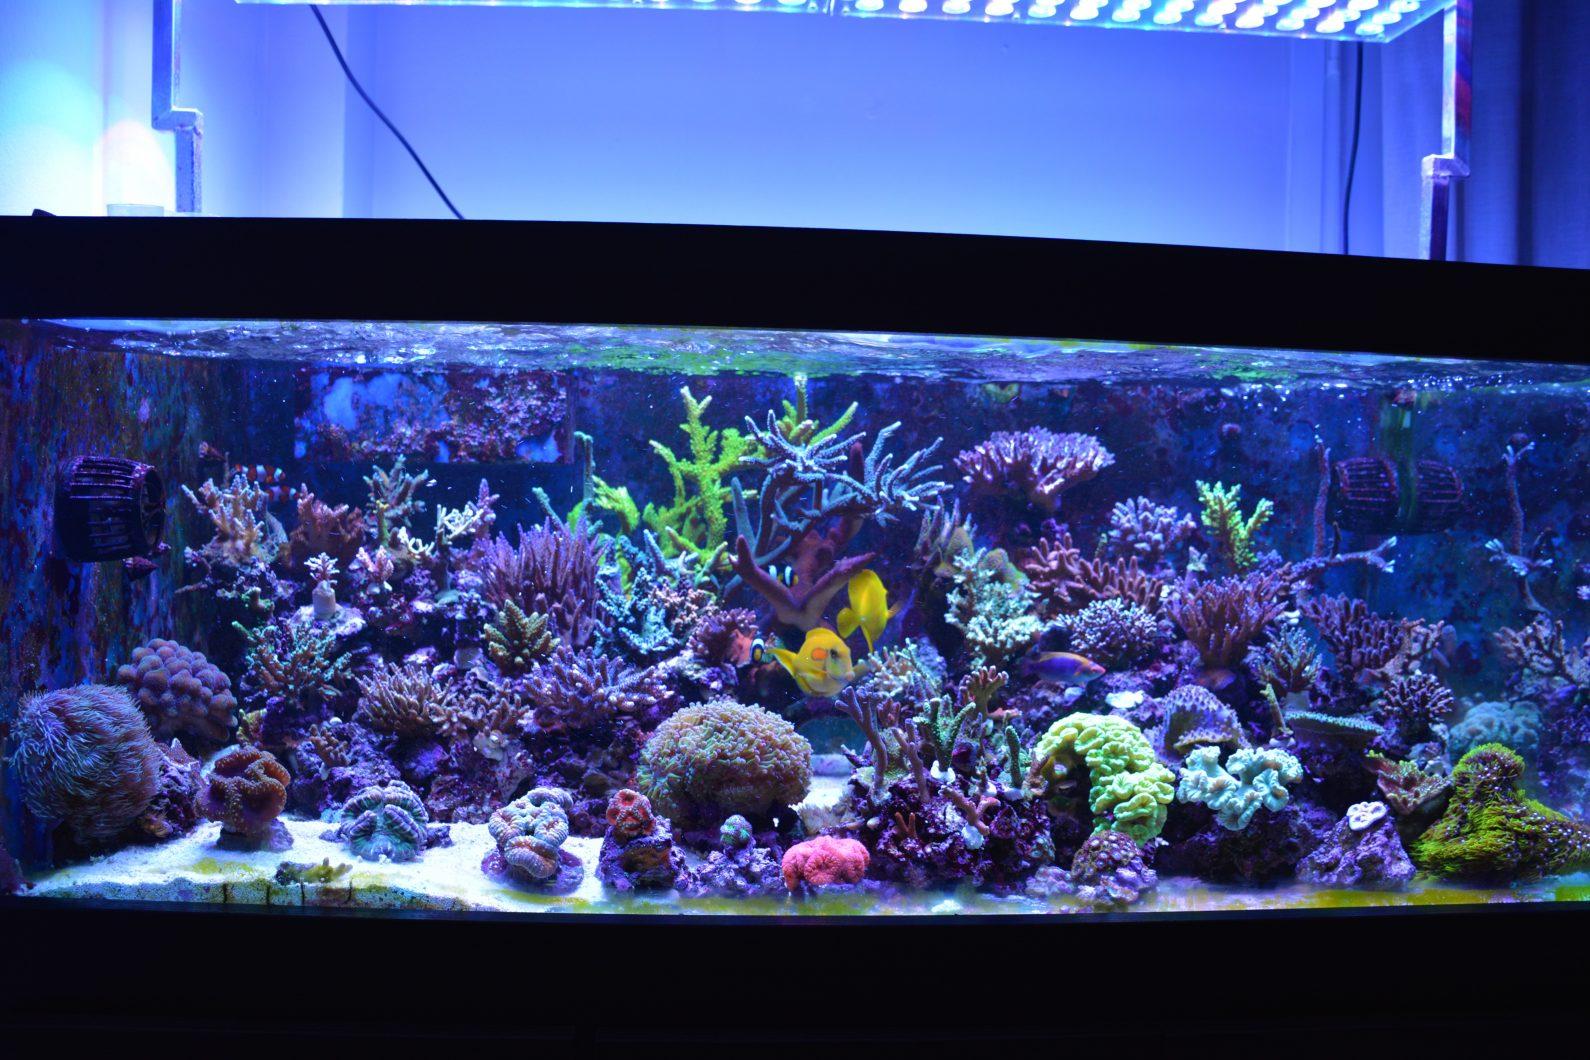 increíble tanque de arrecifes de iluminación LED orphek atlantik